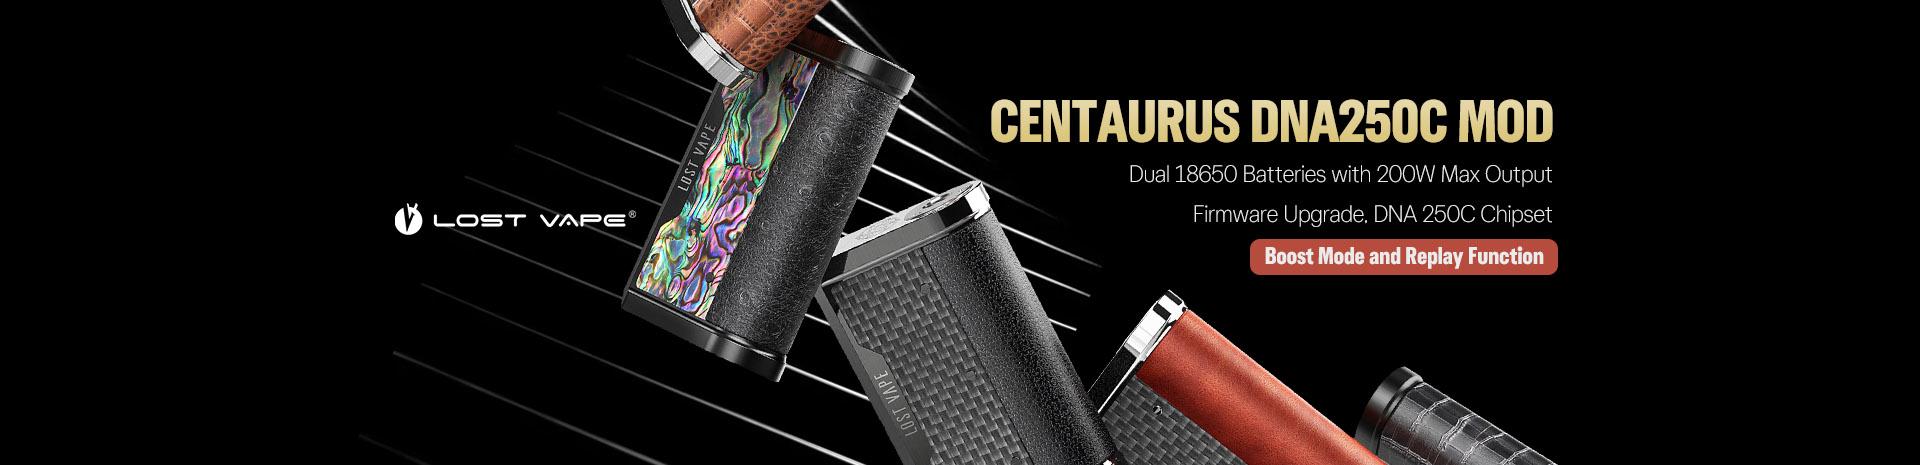 Lost Vape Centaurus DNA250C Mod Banner